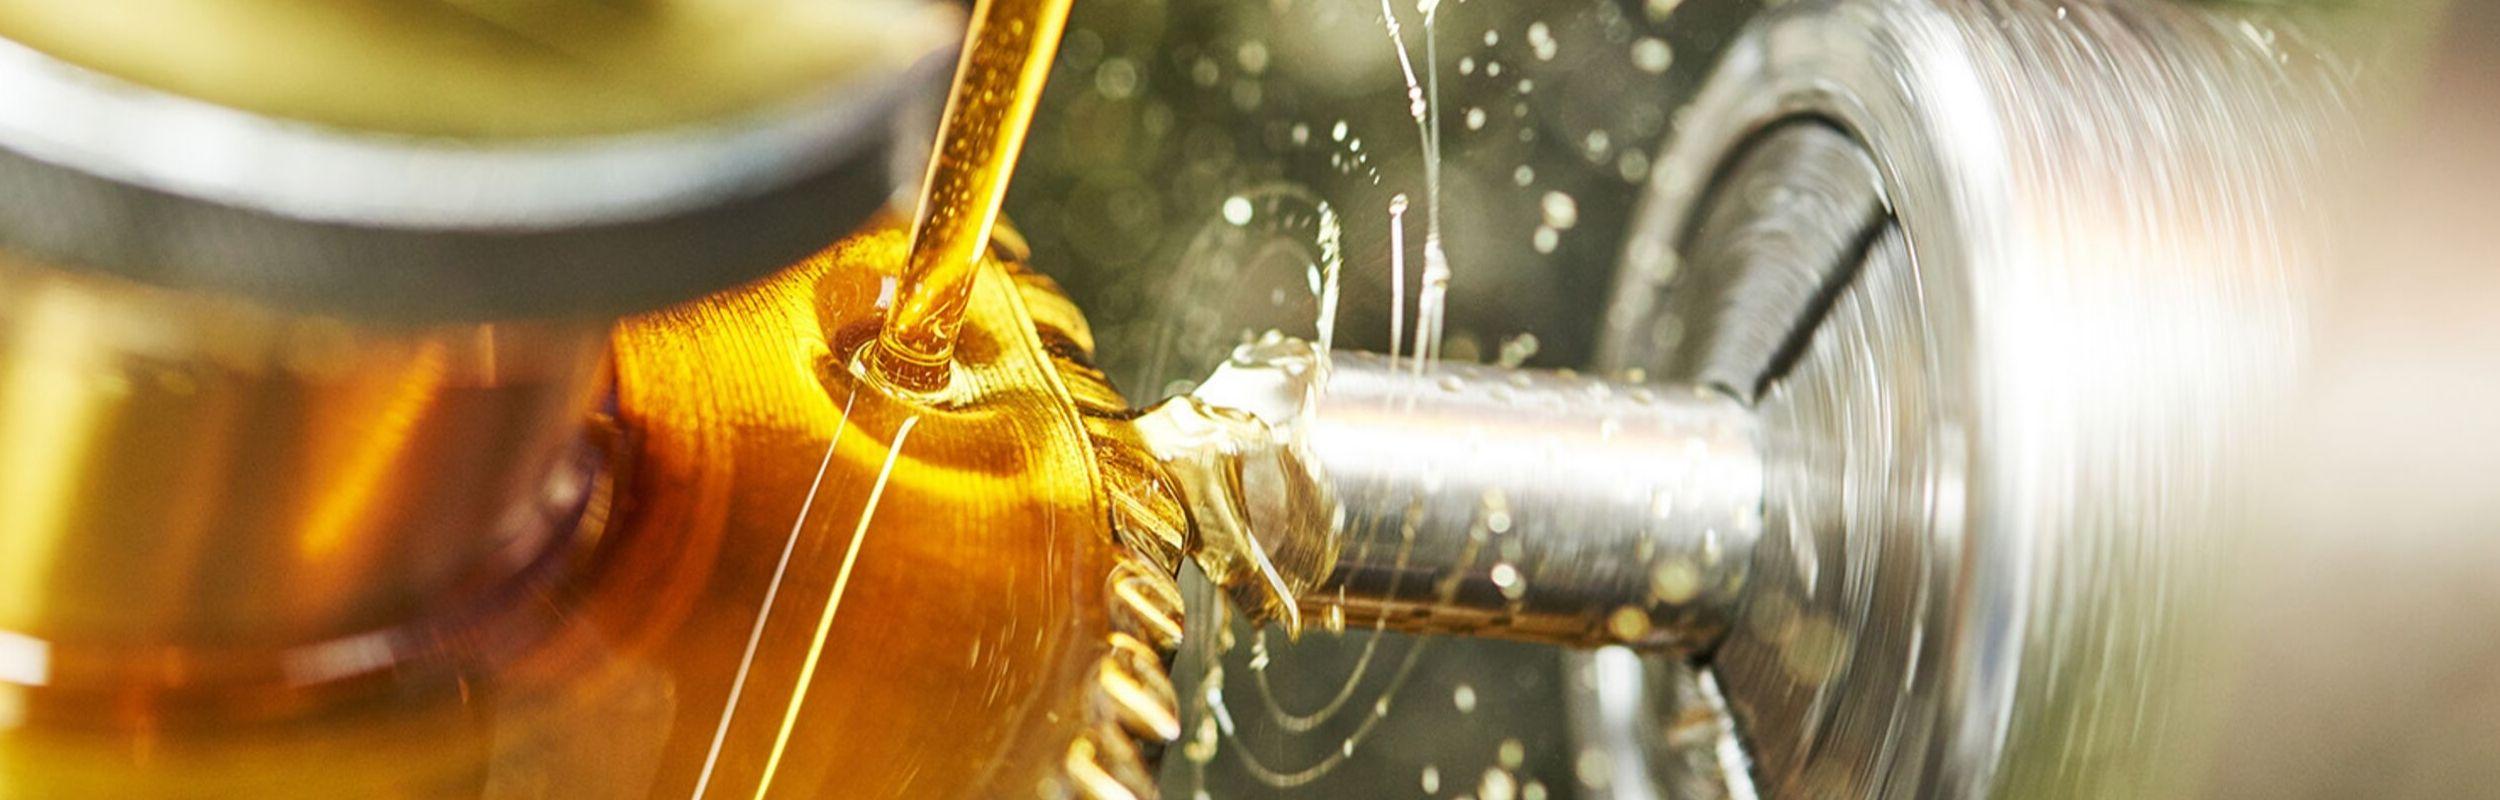 Choosing The Right Industrial Gear Oil